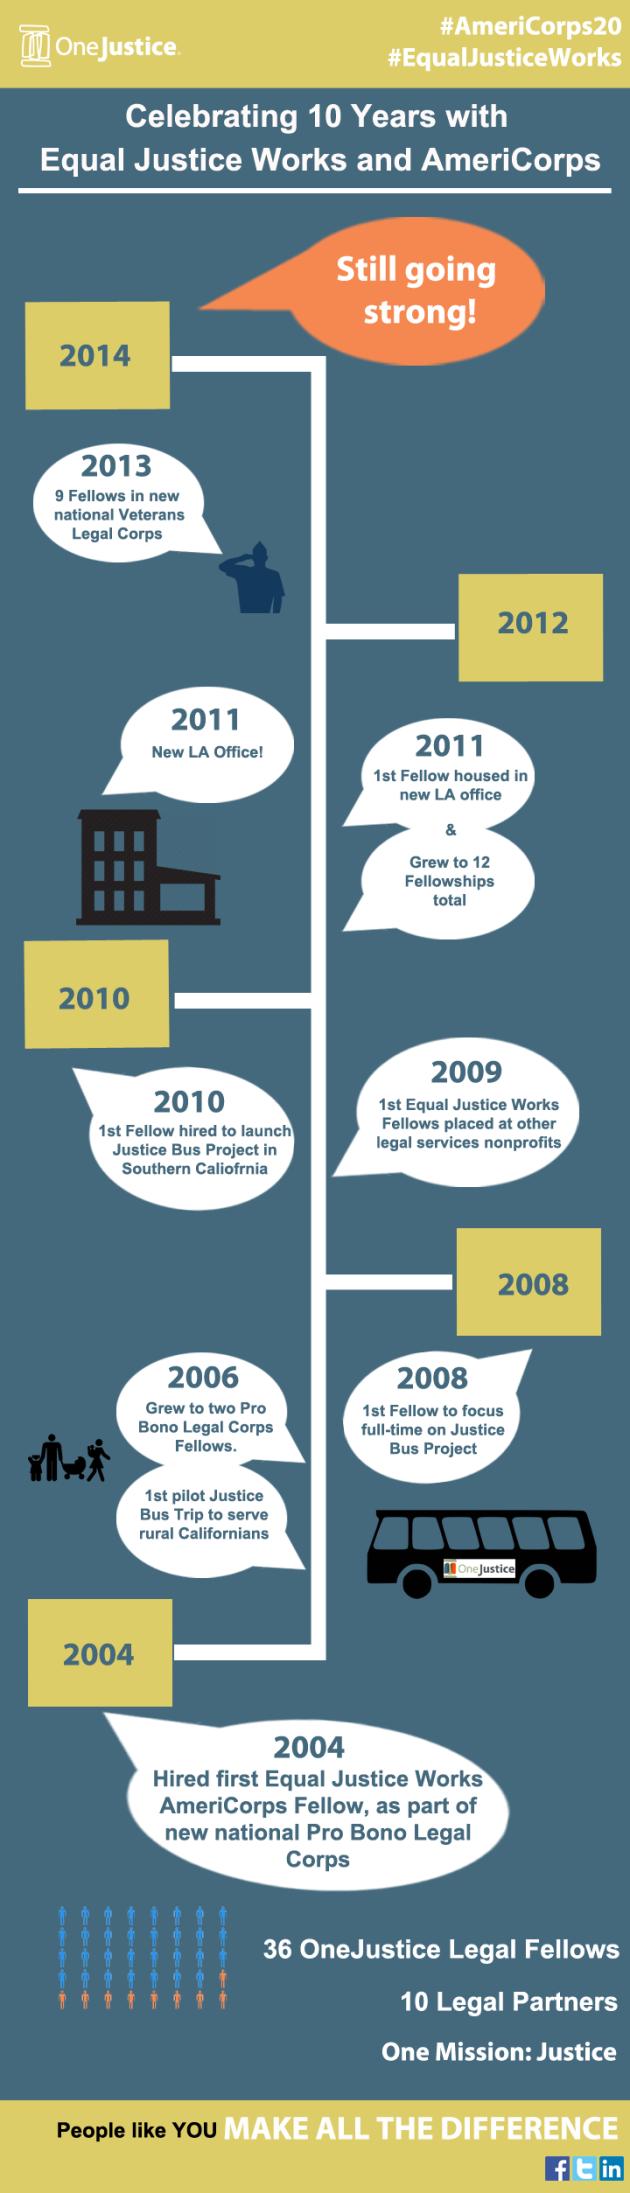 AmeriCorps Infographic